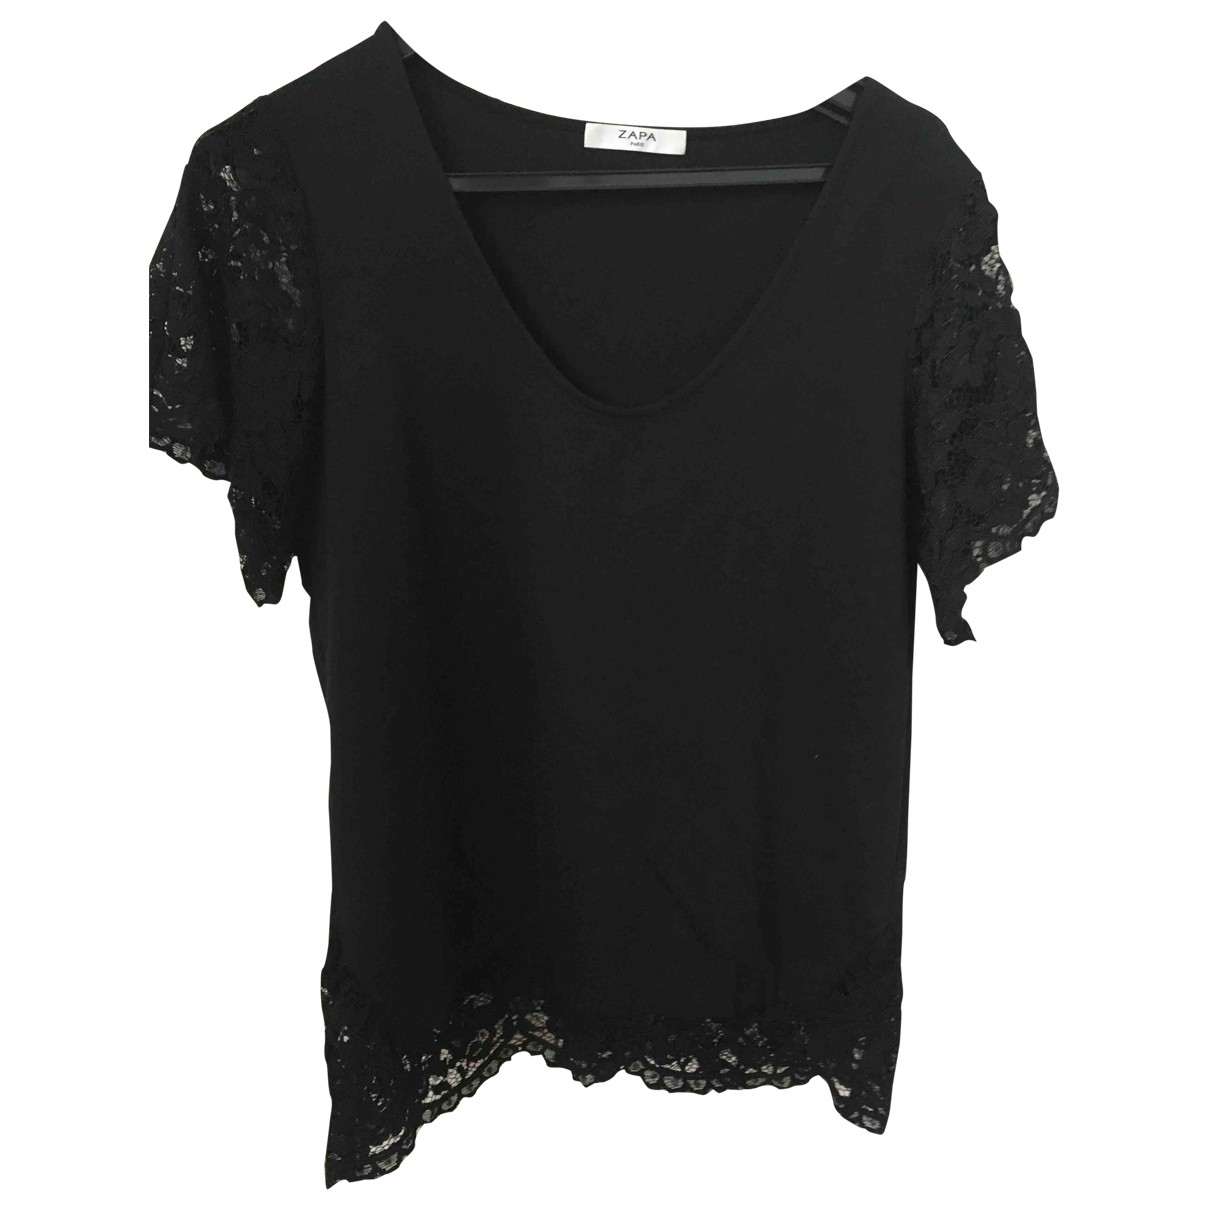 Zapa - Top   pour femme en coton - noir